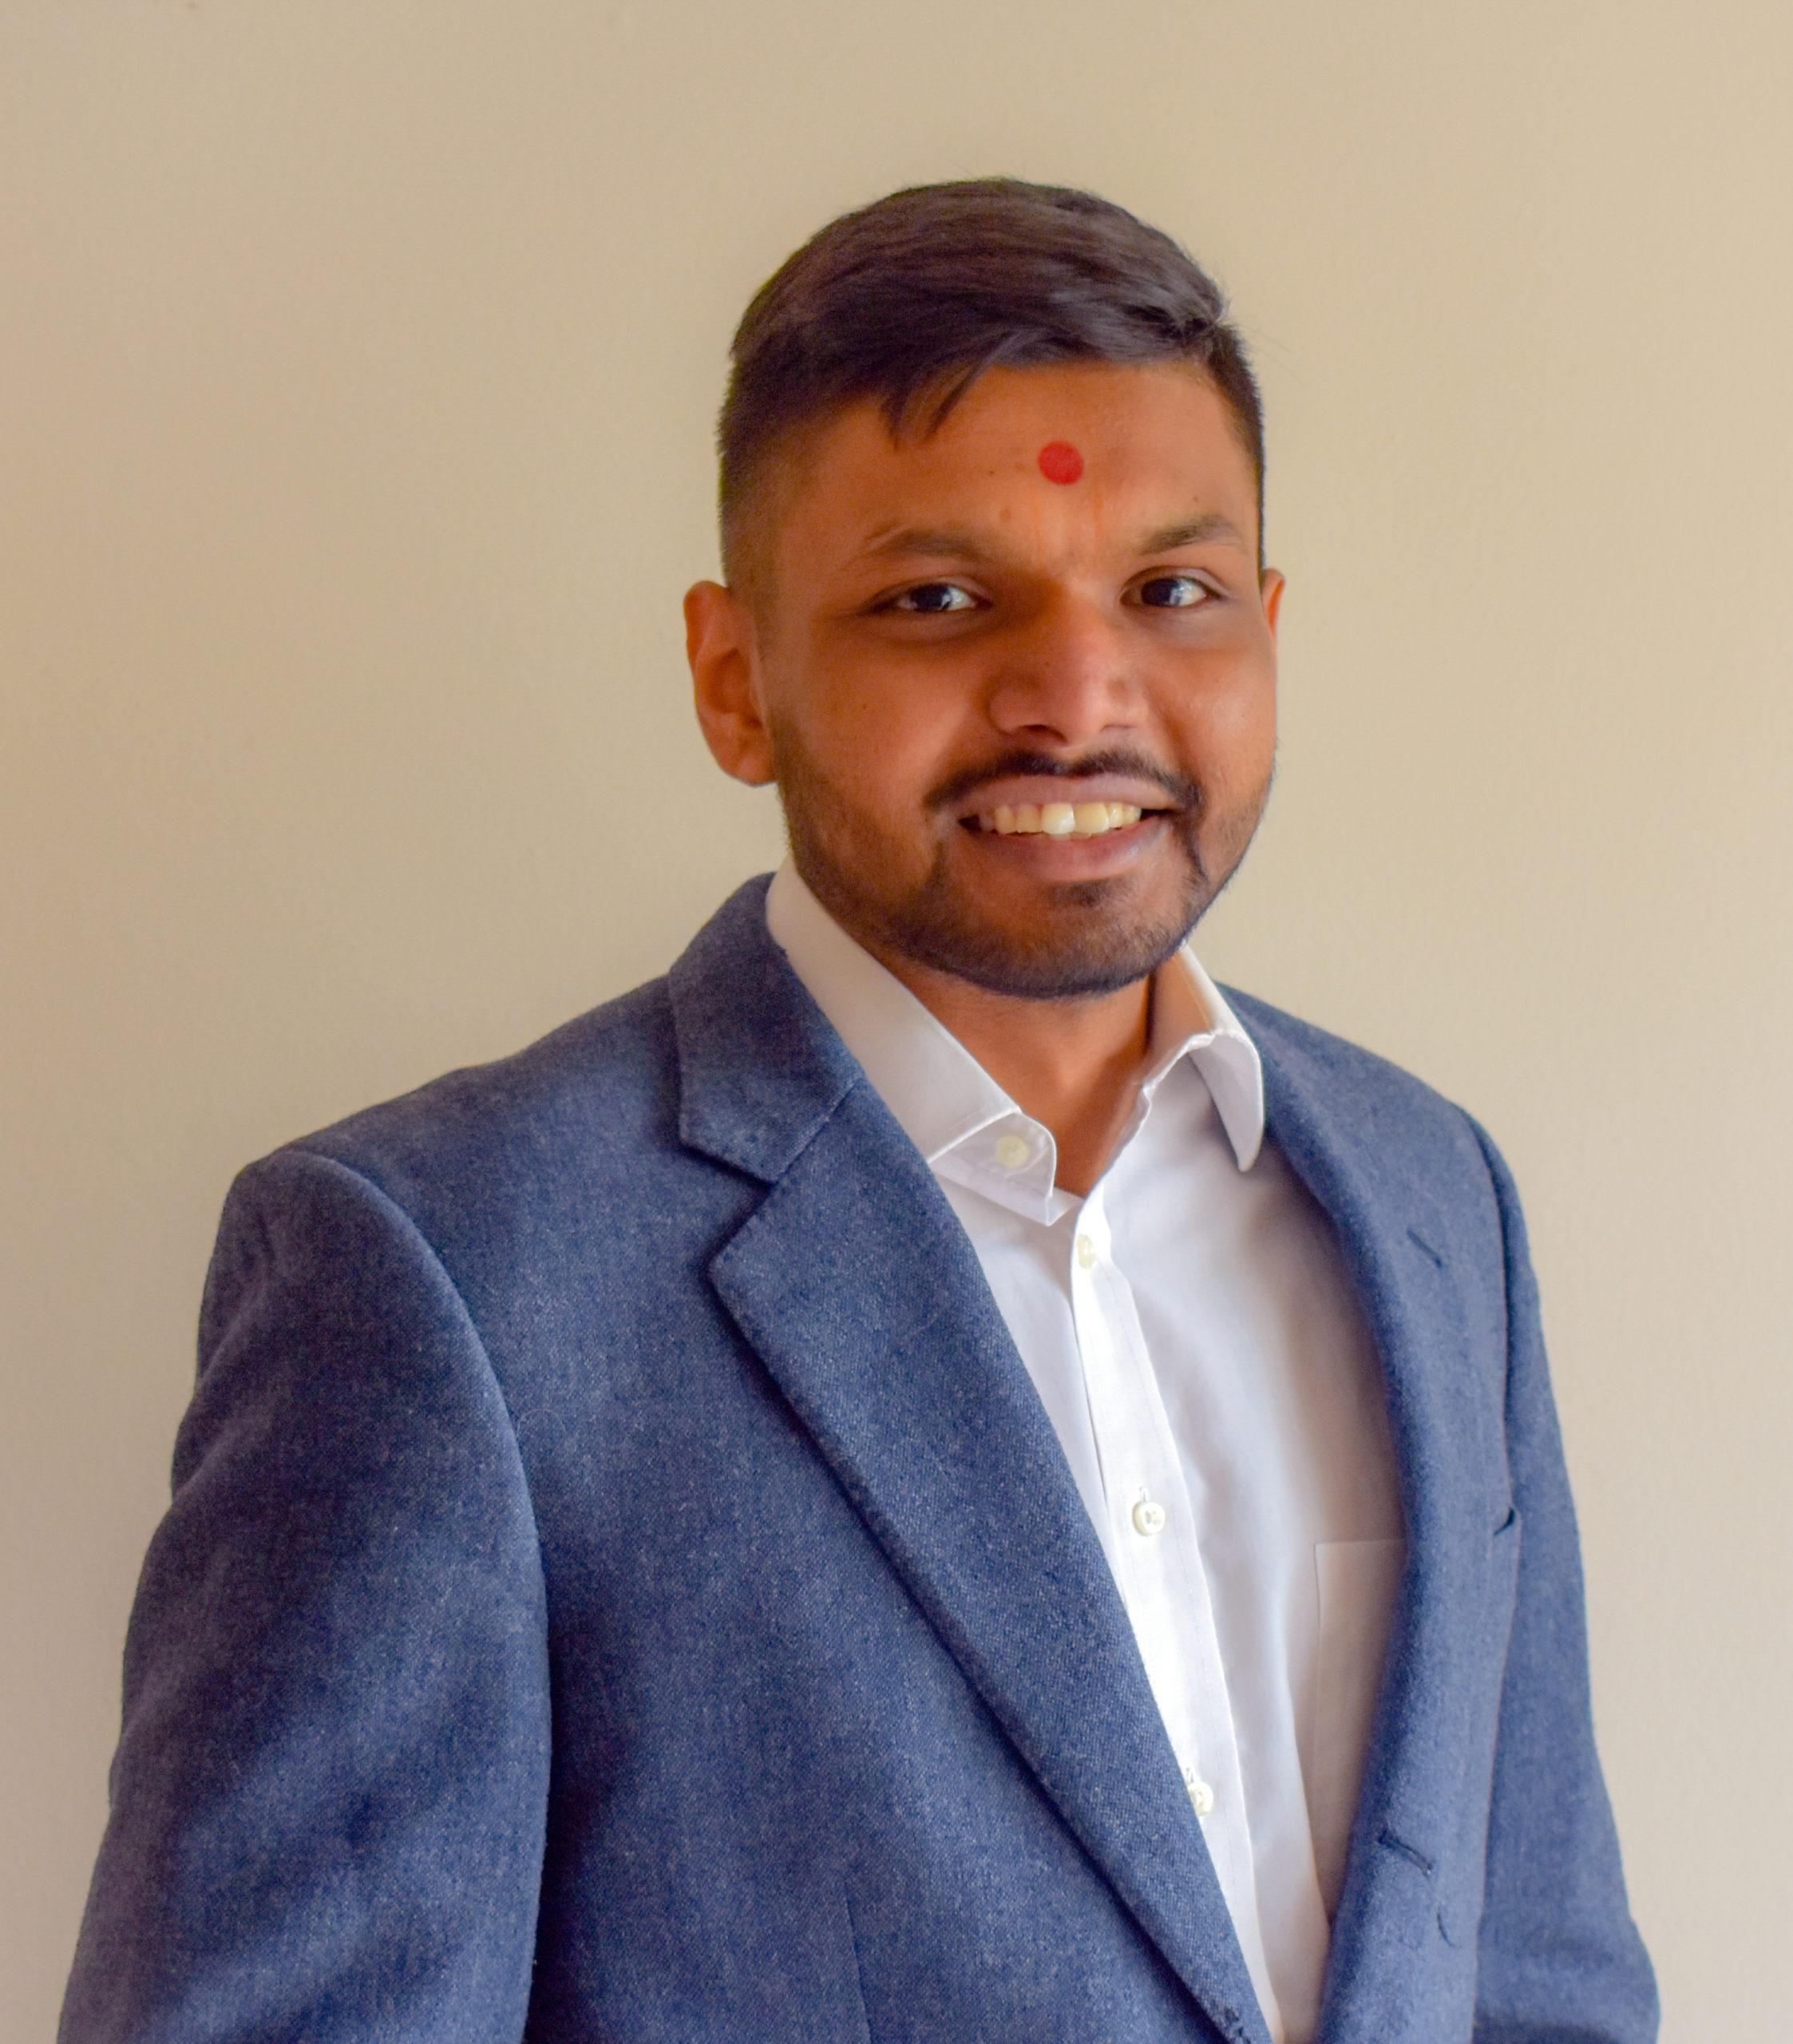 Portrait of Deep Patel